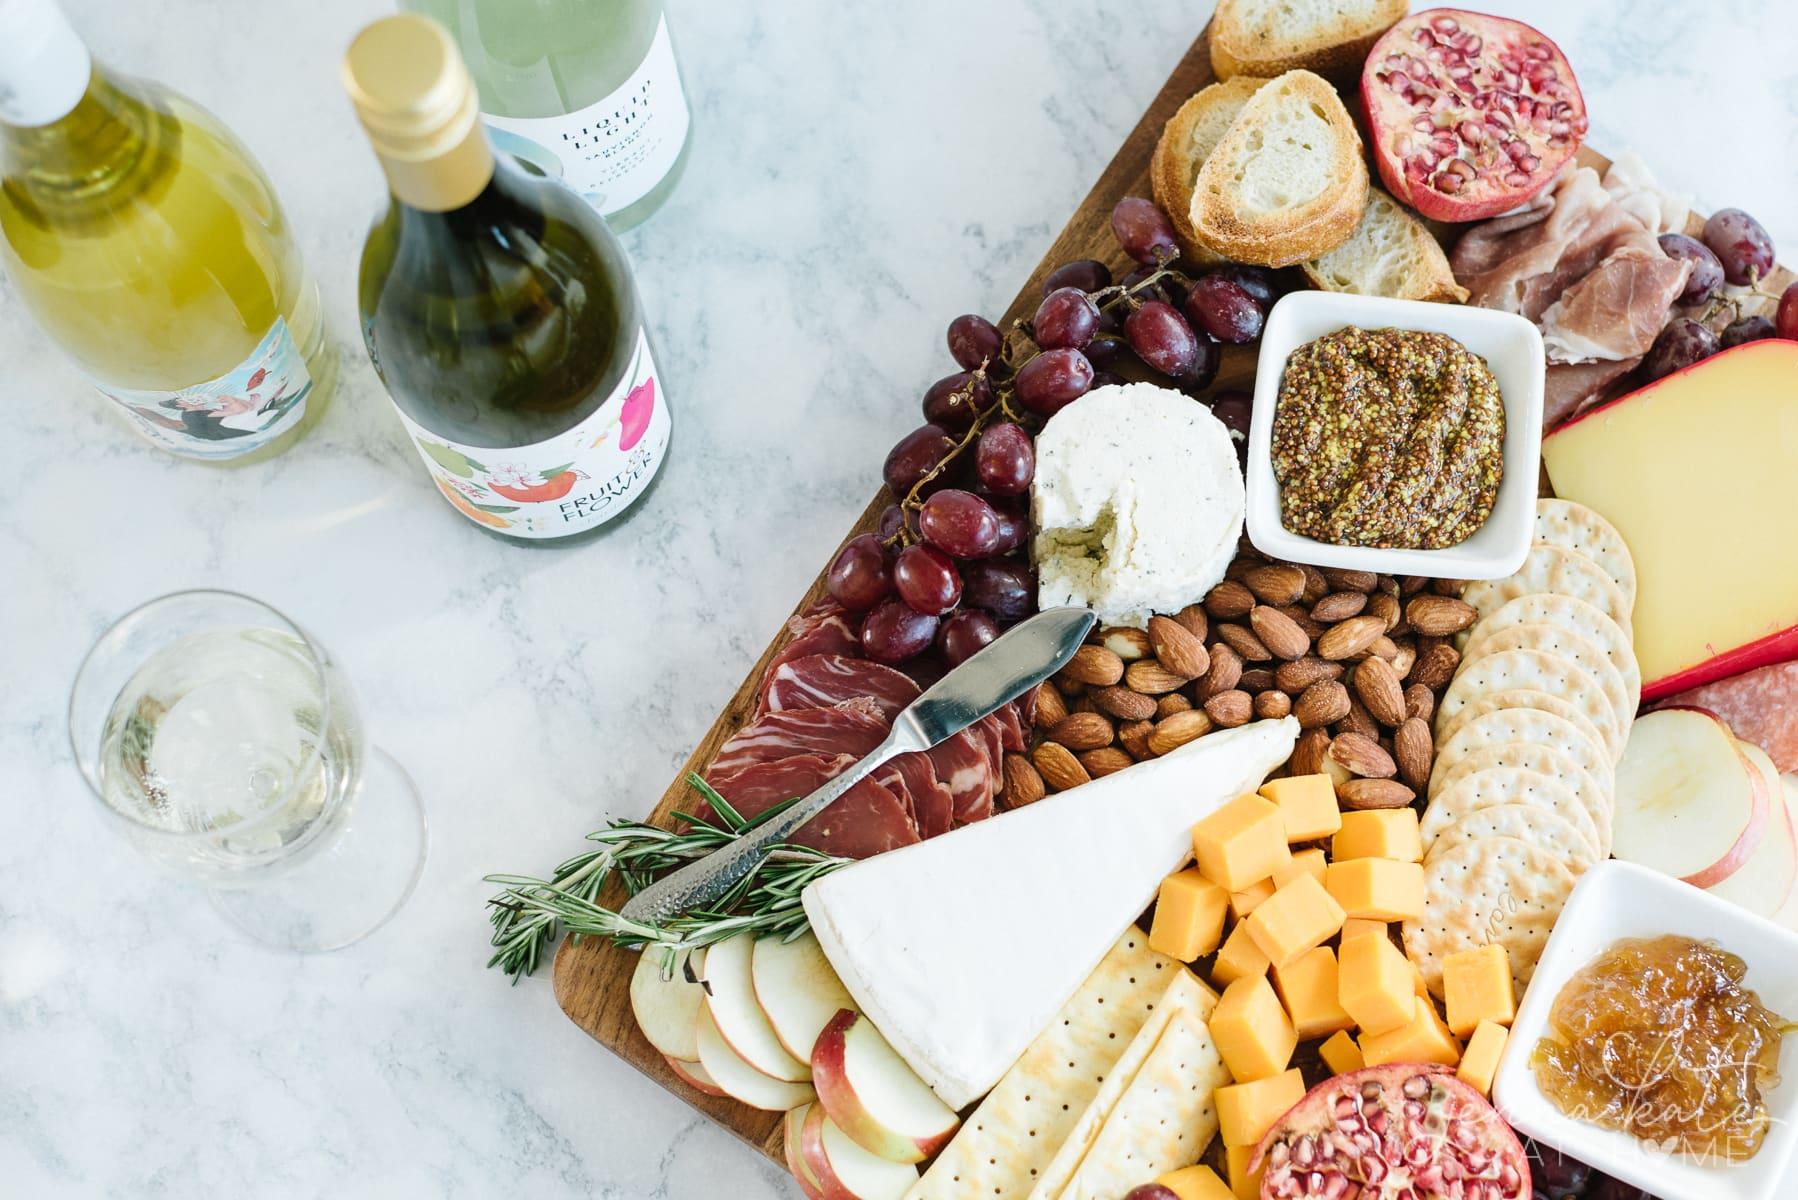 Bottles of wine served alongside cheese